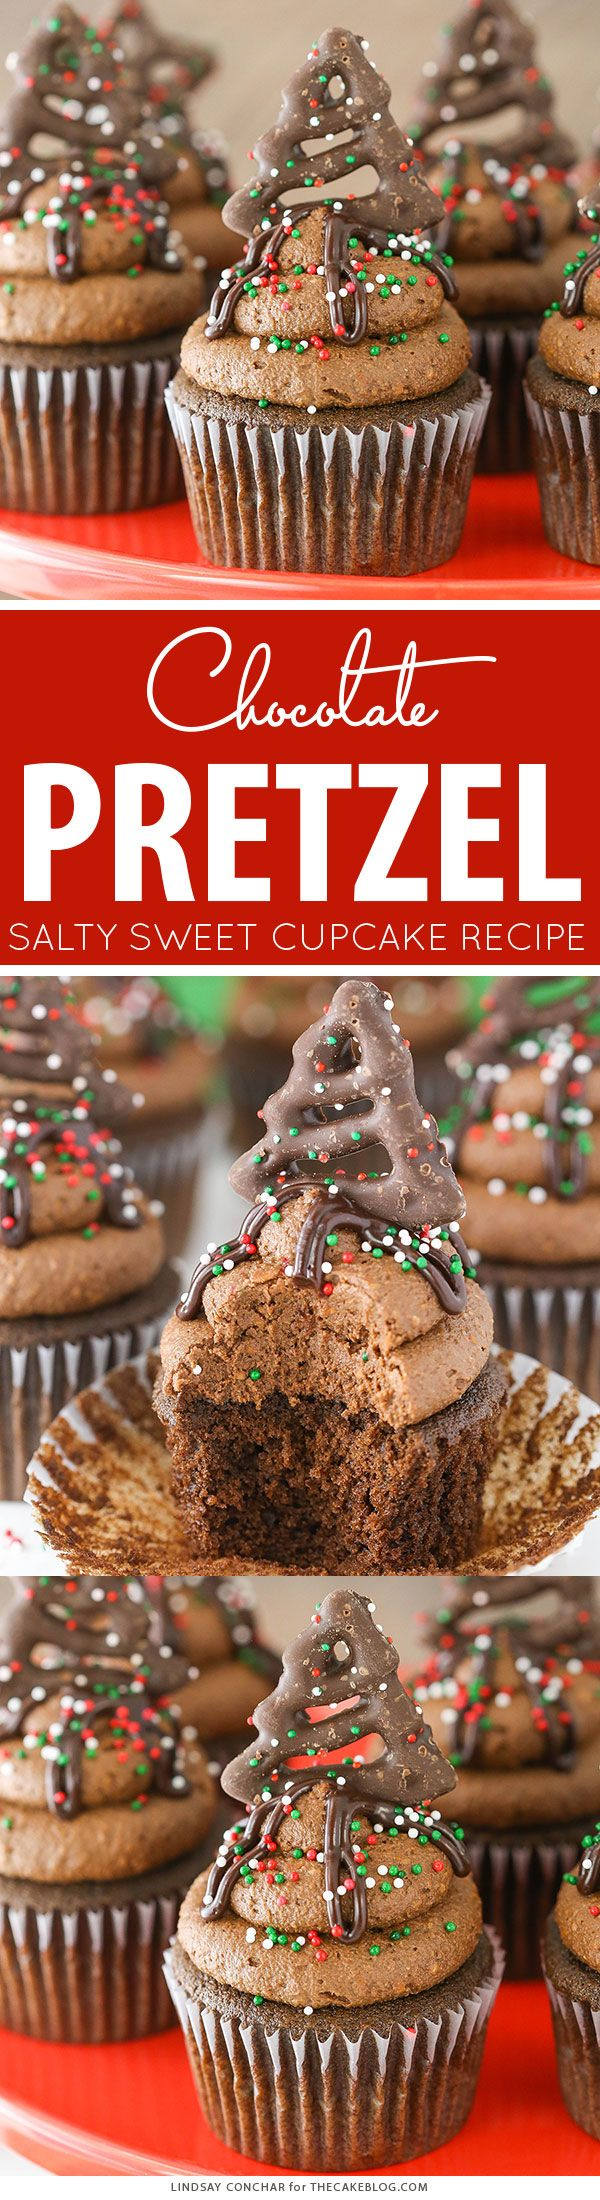 Chocolate Pretzel Cupcakes - salty sweet holiday cupcake | Lindsay Conchar for TheCakeBlog.com